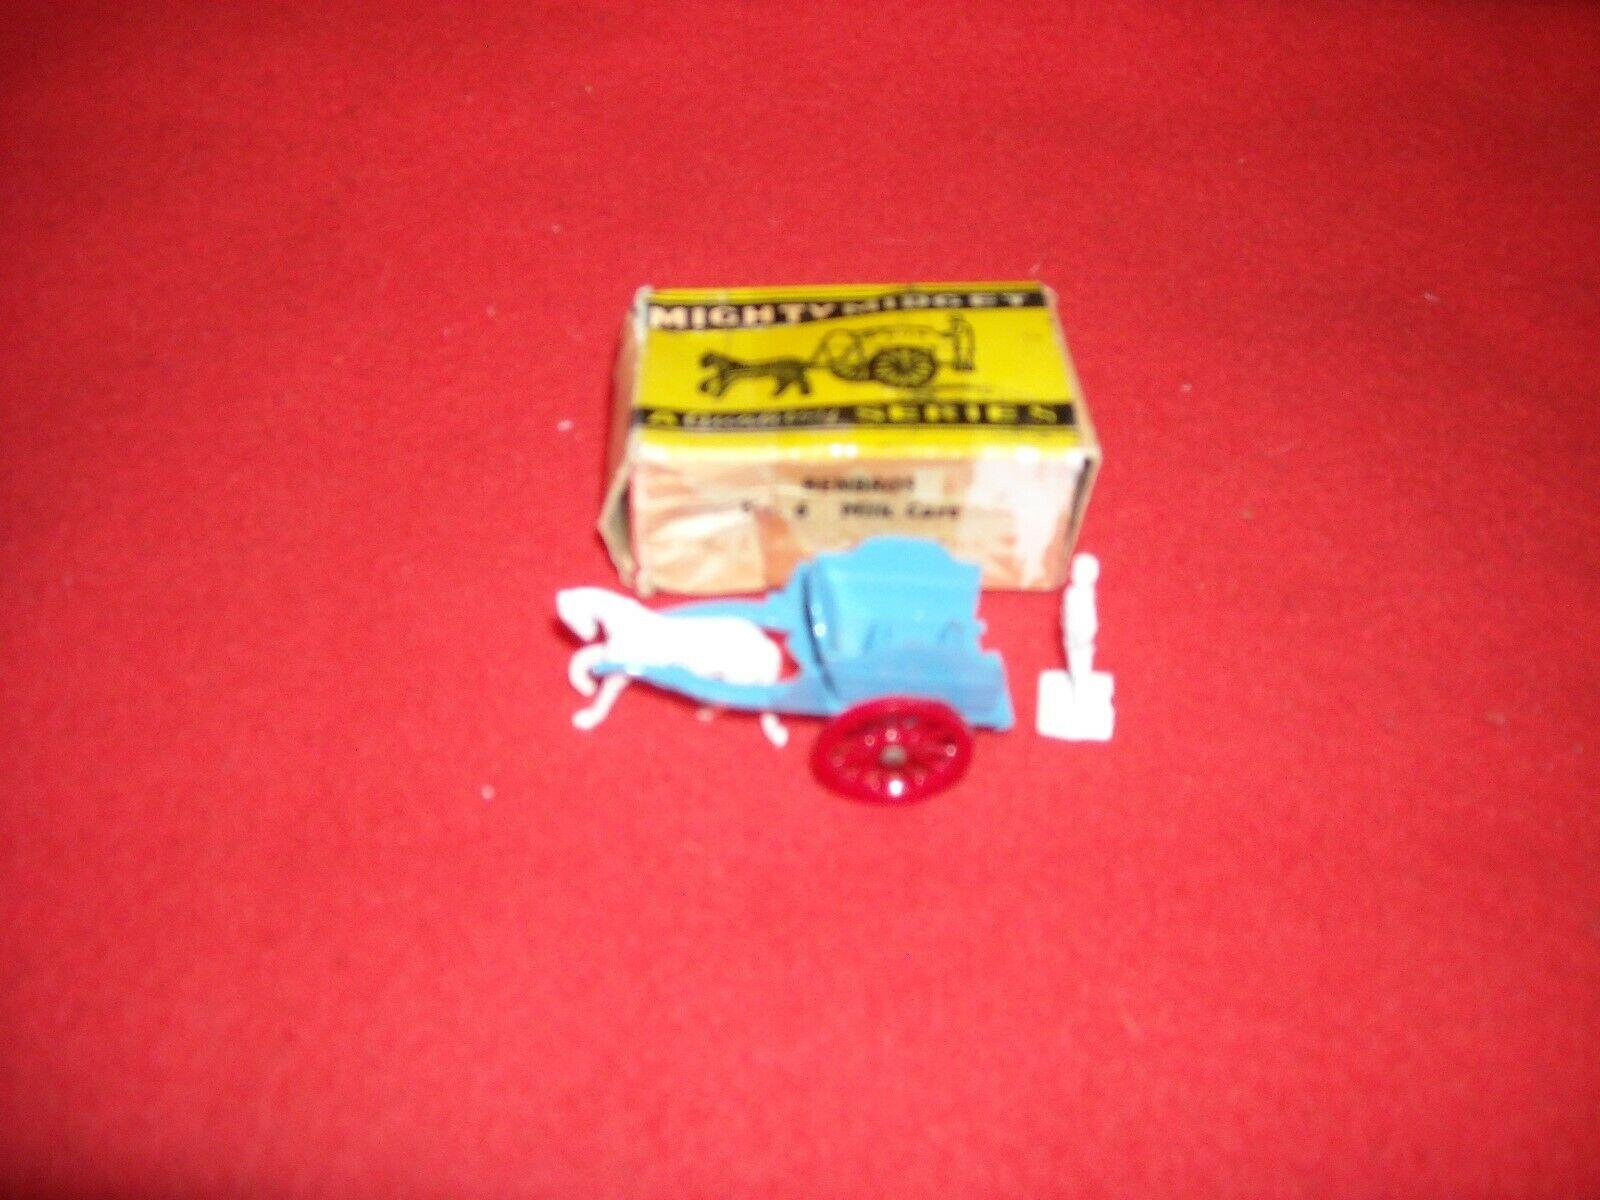 RARE MIGHTY MIDGET MILK CART NO.6 by BENBROS IN ORIGINAL BOX IN SUPERB CONDITION